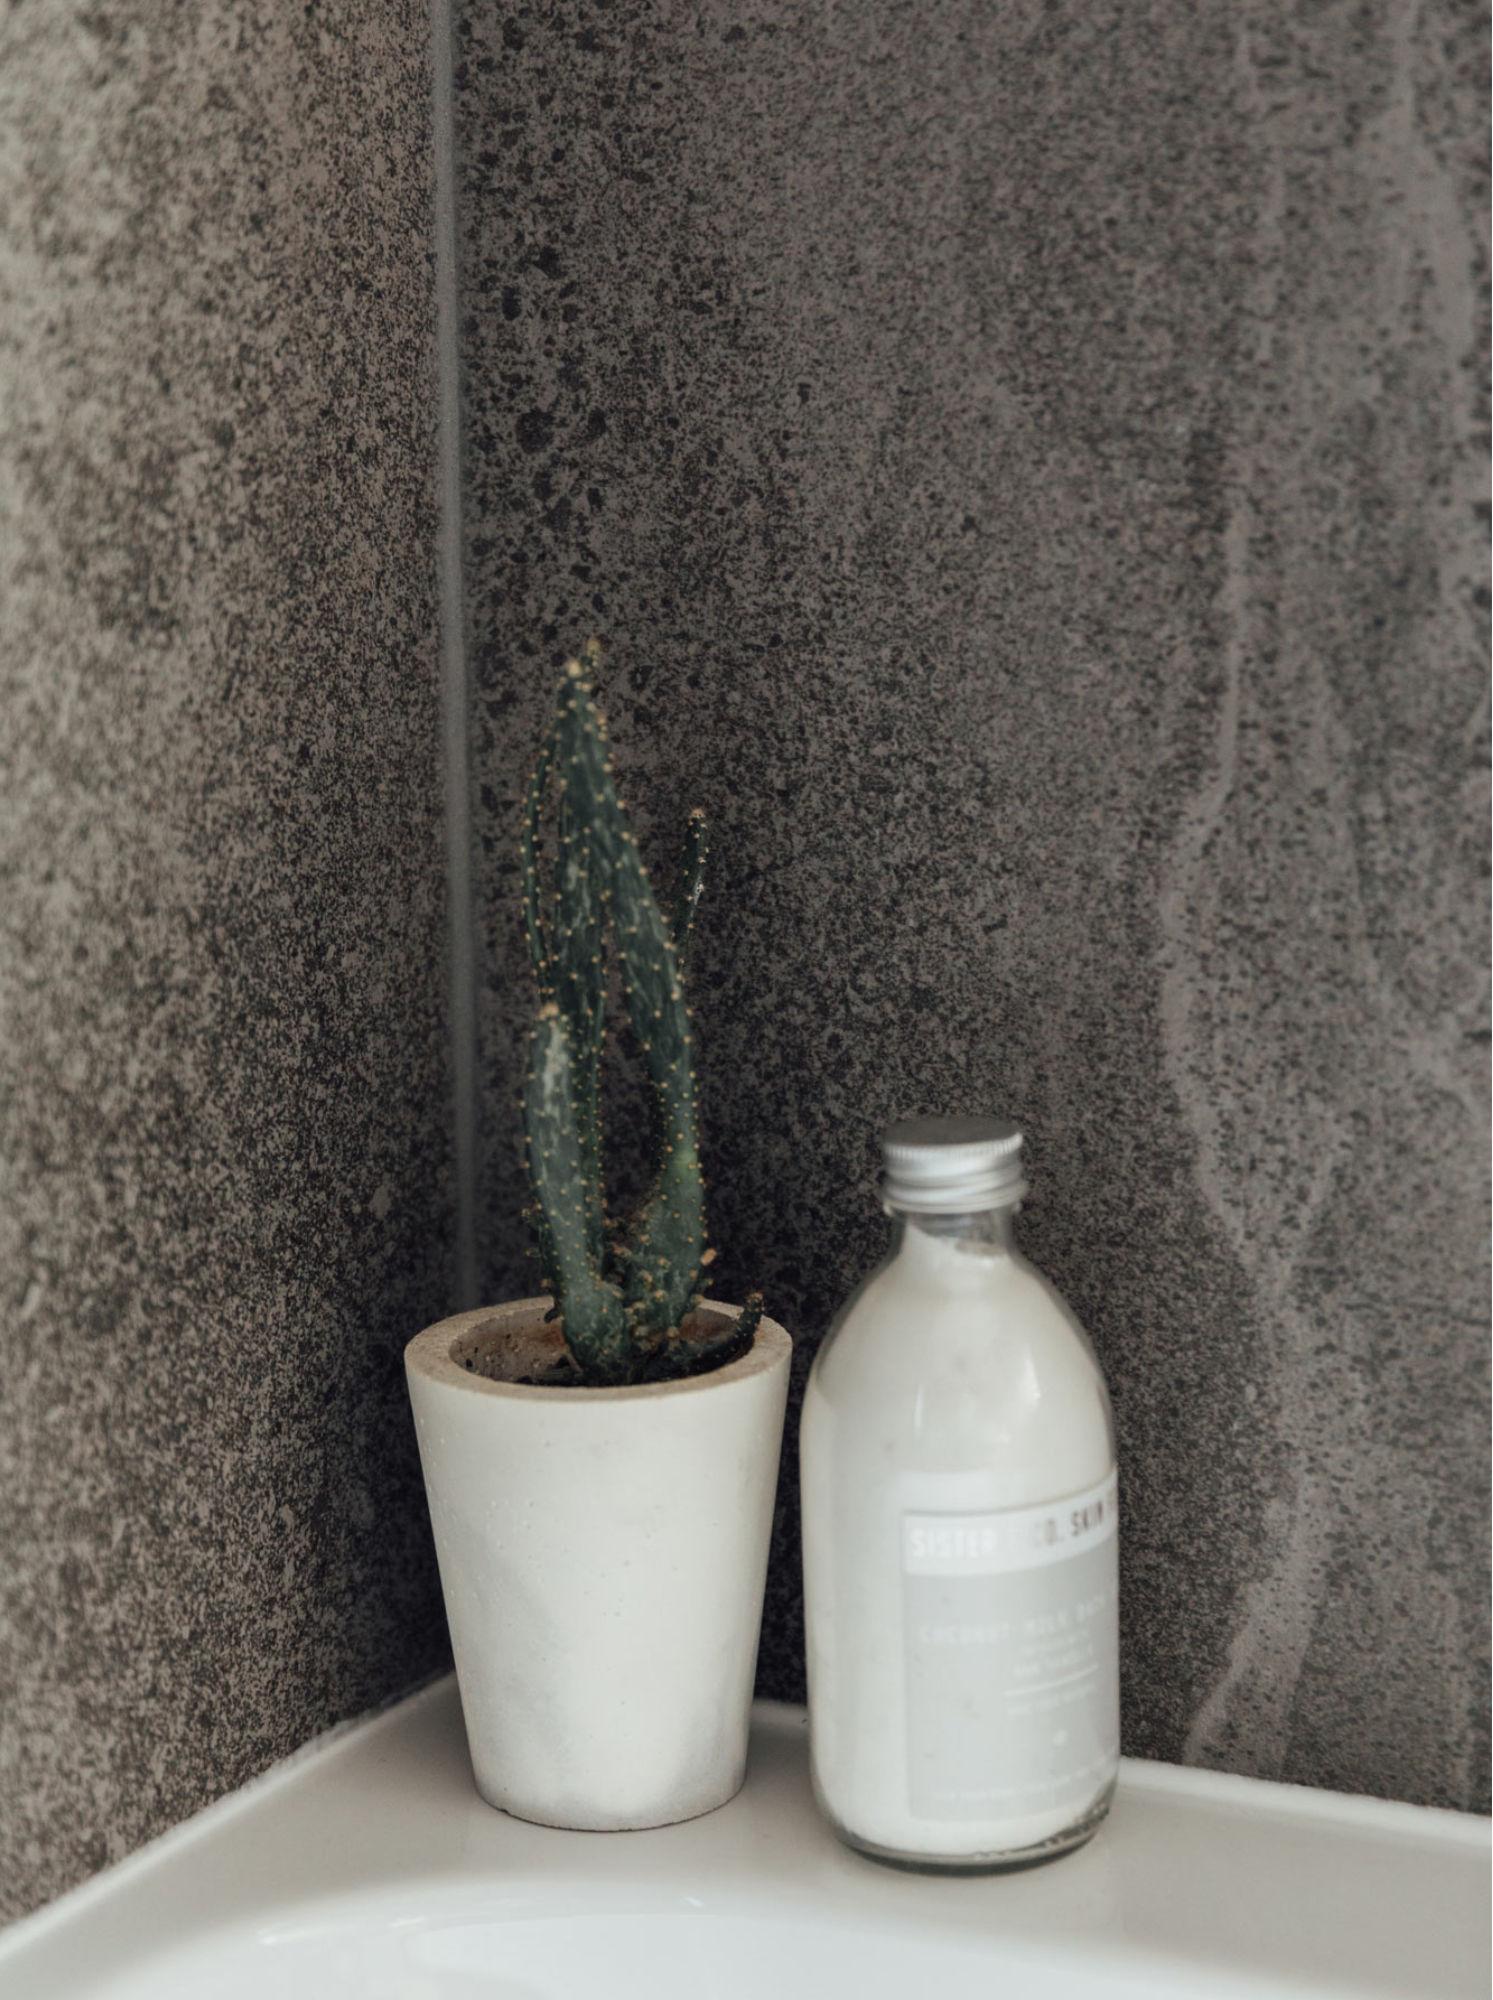 Cropped 11a-dark-bathroom-details-1.jpg